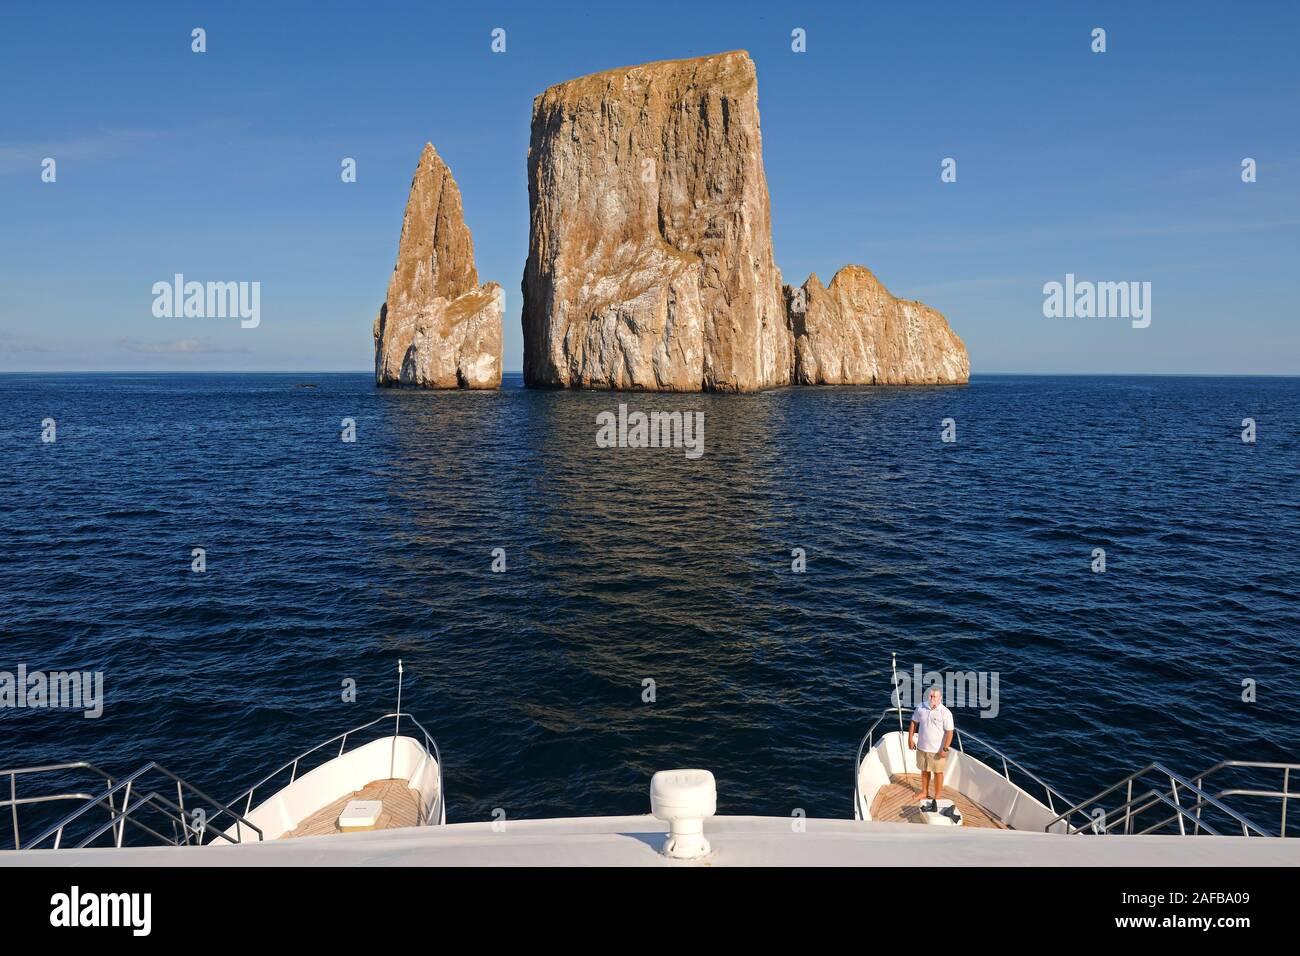 Kicker Rock nahe der Insel San Cristobal, Galapagos, Unesco Welterbe, Ekuador, Suedamerika Stock Photo